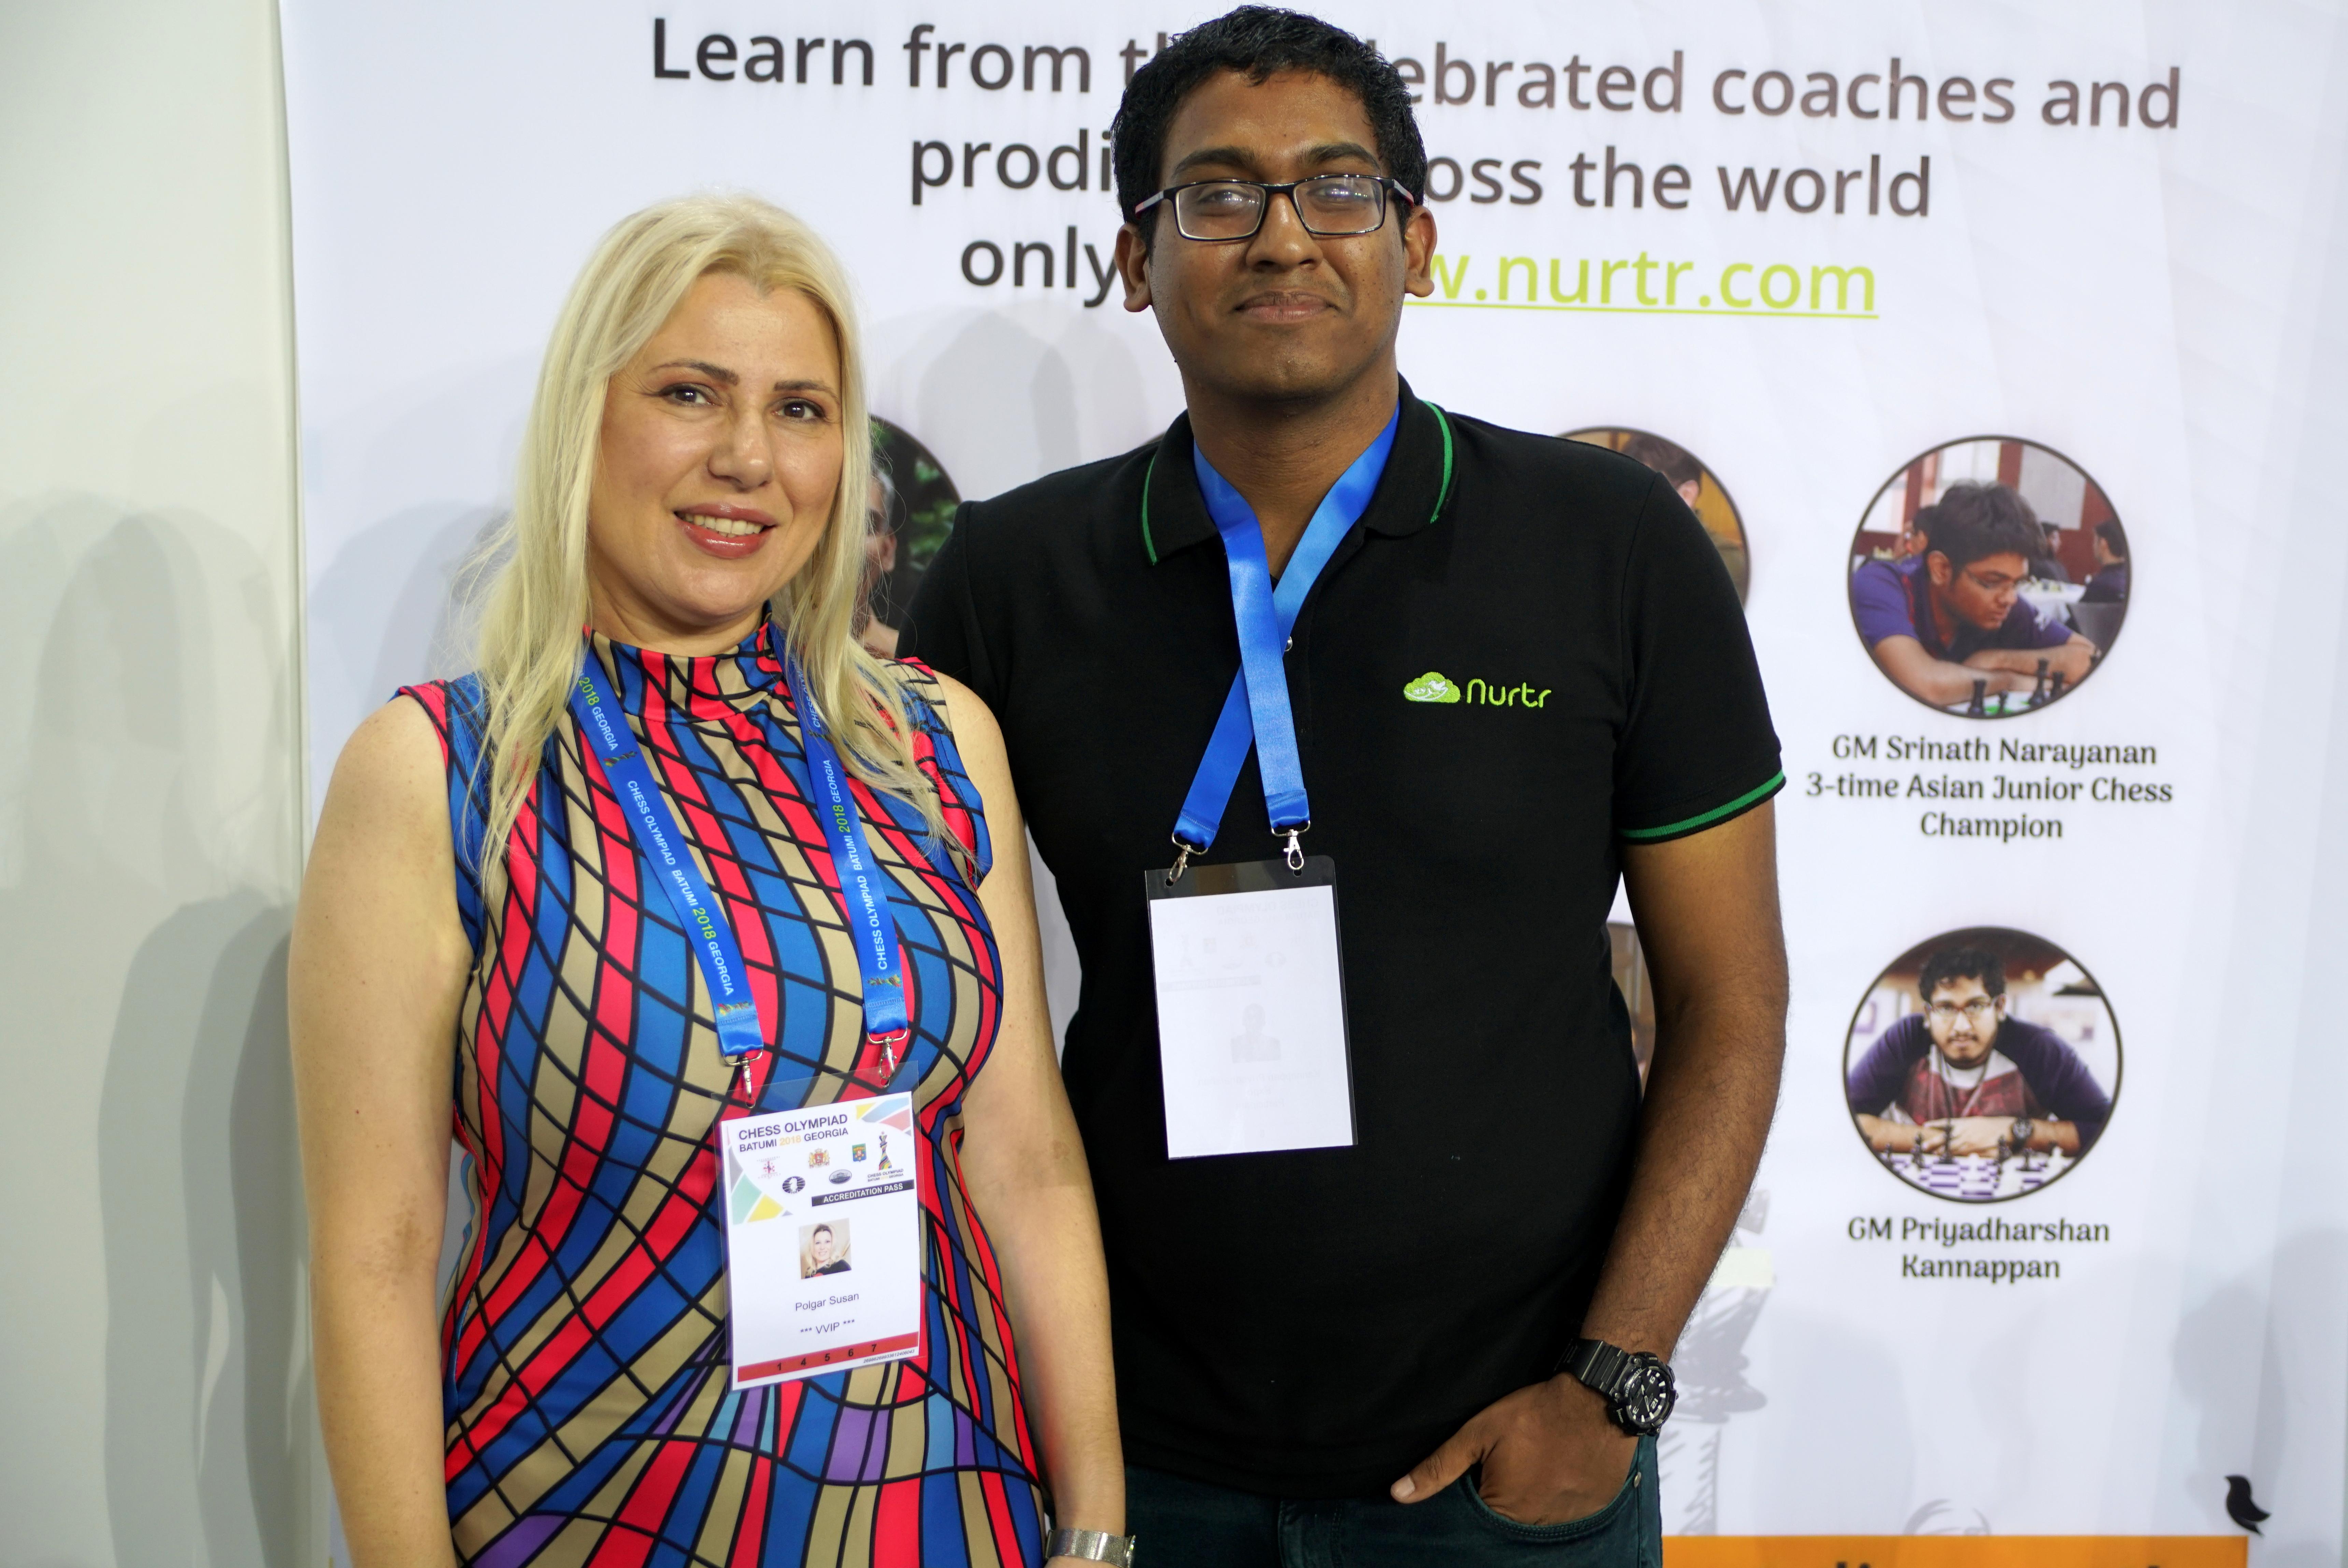 Priyadharshan with Susan Polgar